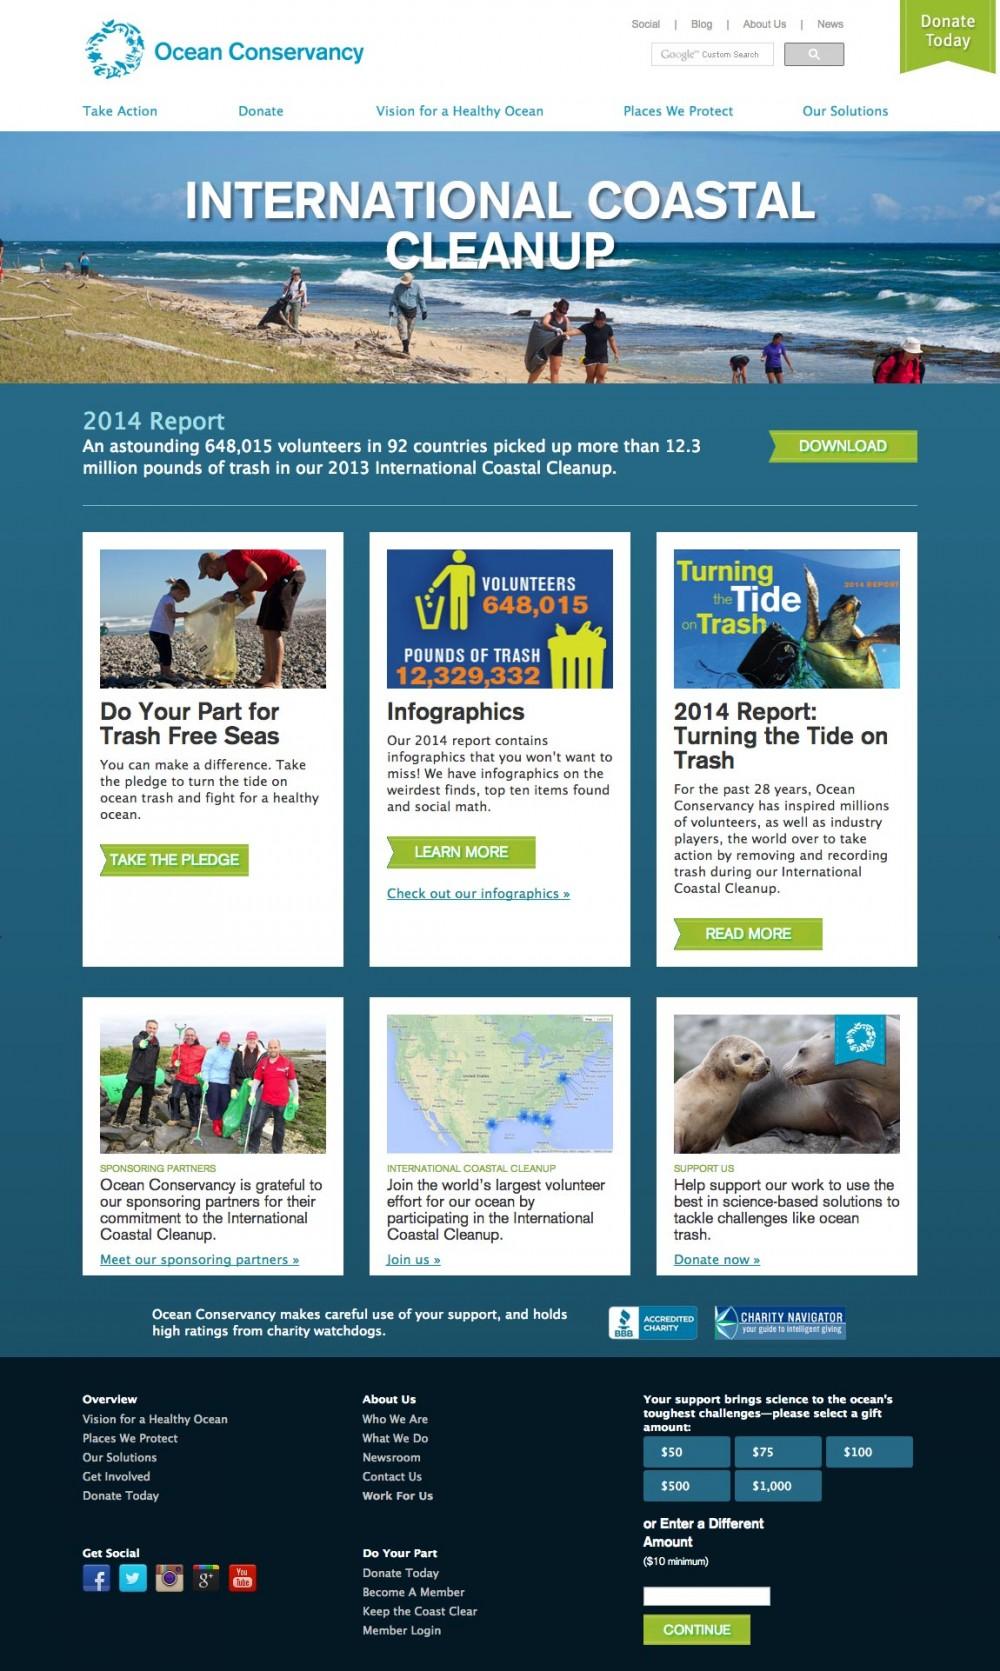 Ocean Conservancy: International Coastal Cleanup